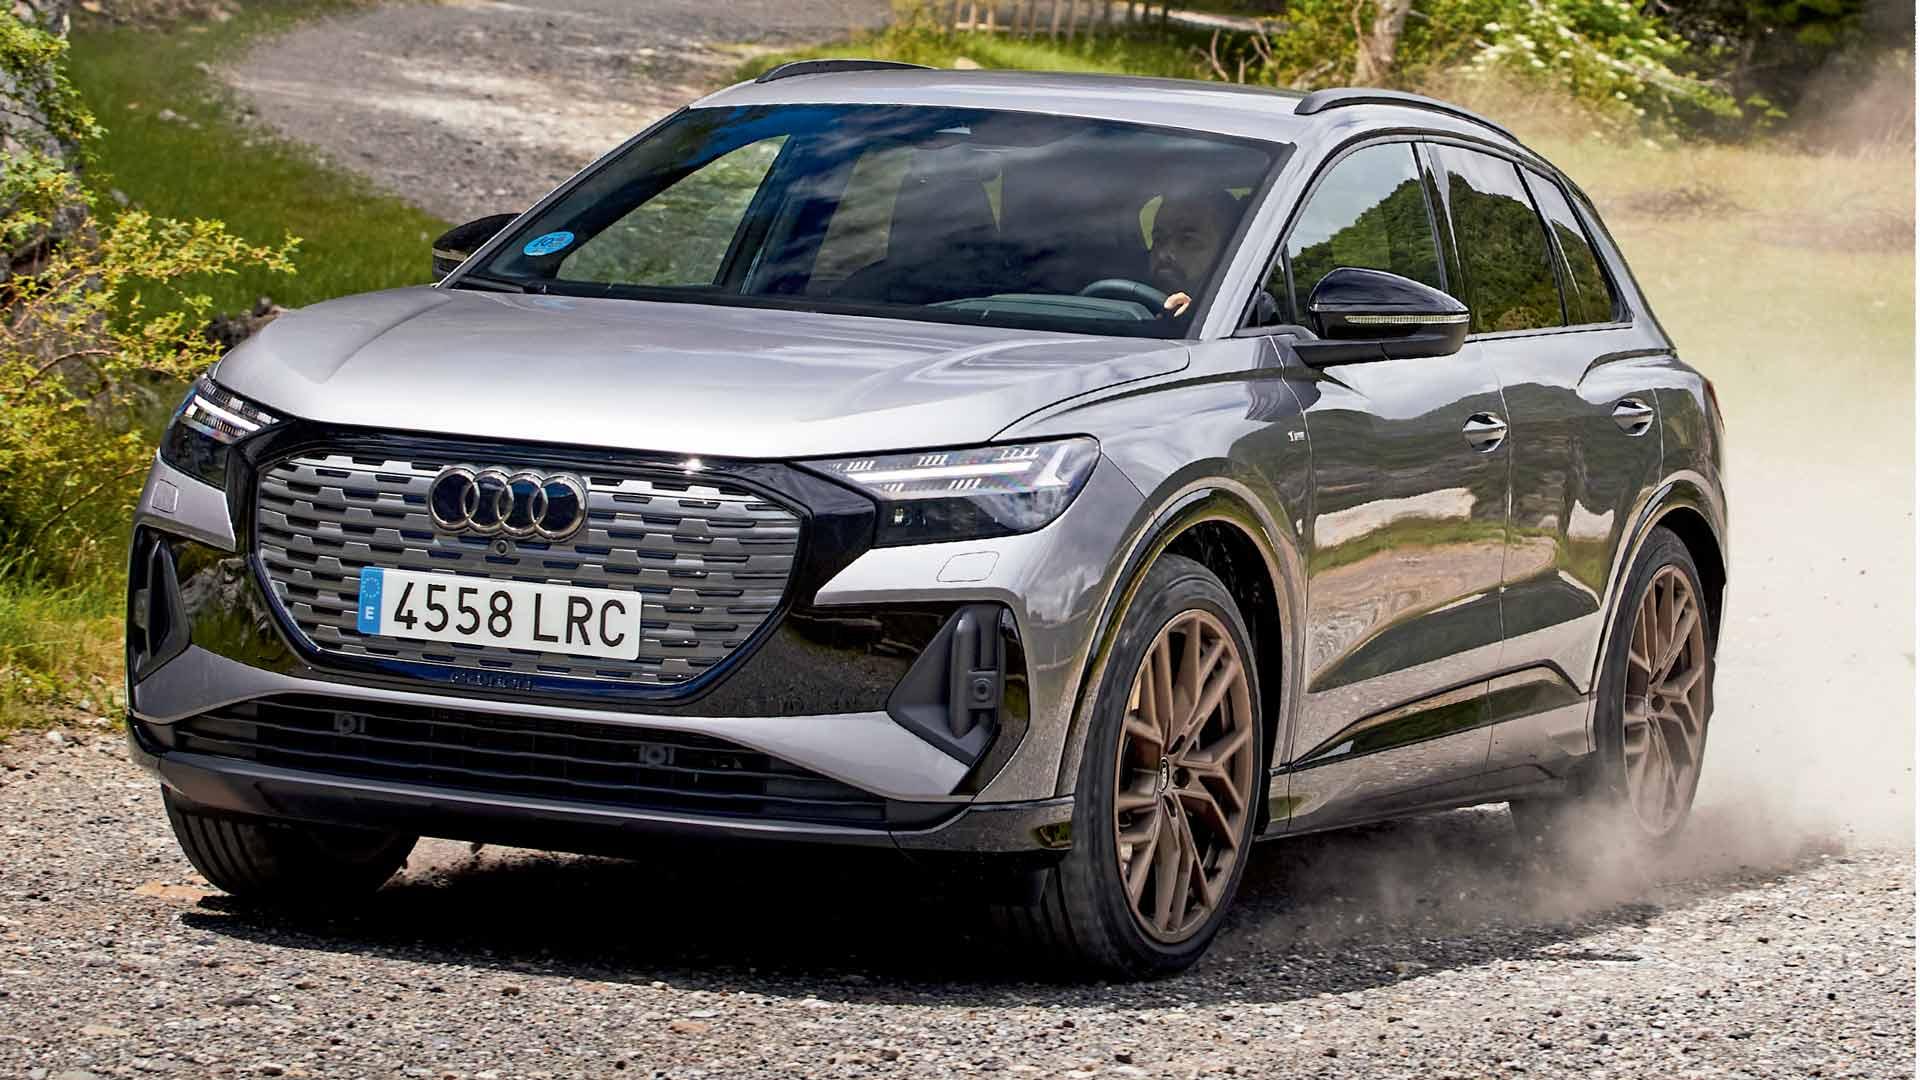 Prueba Audi Q4 e-tron 50 2021, ¿mucho mejor que un Volkswagen ID.4?